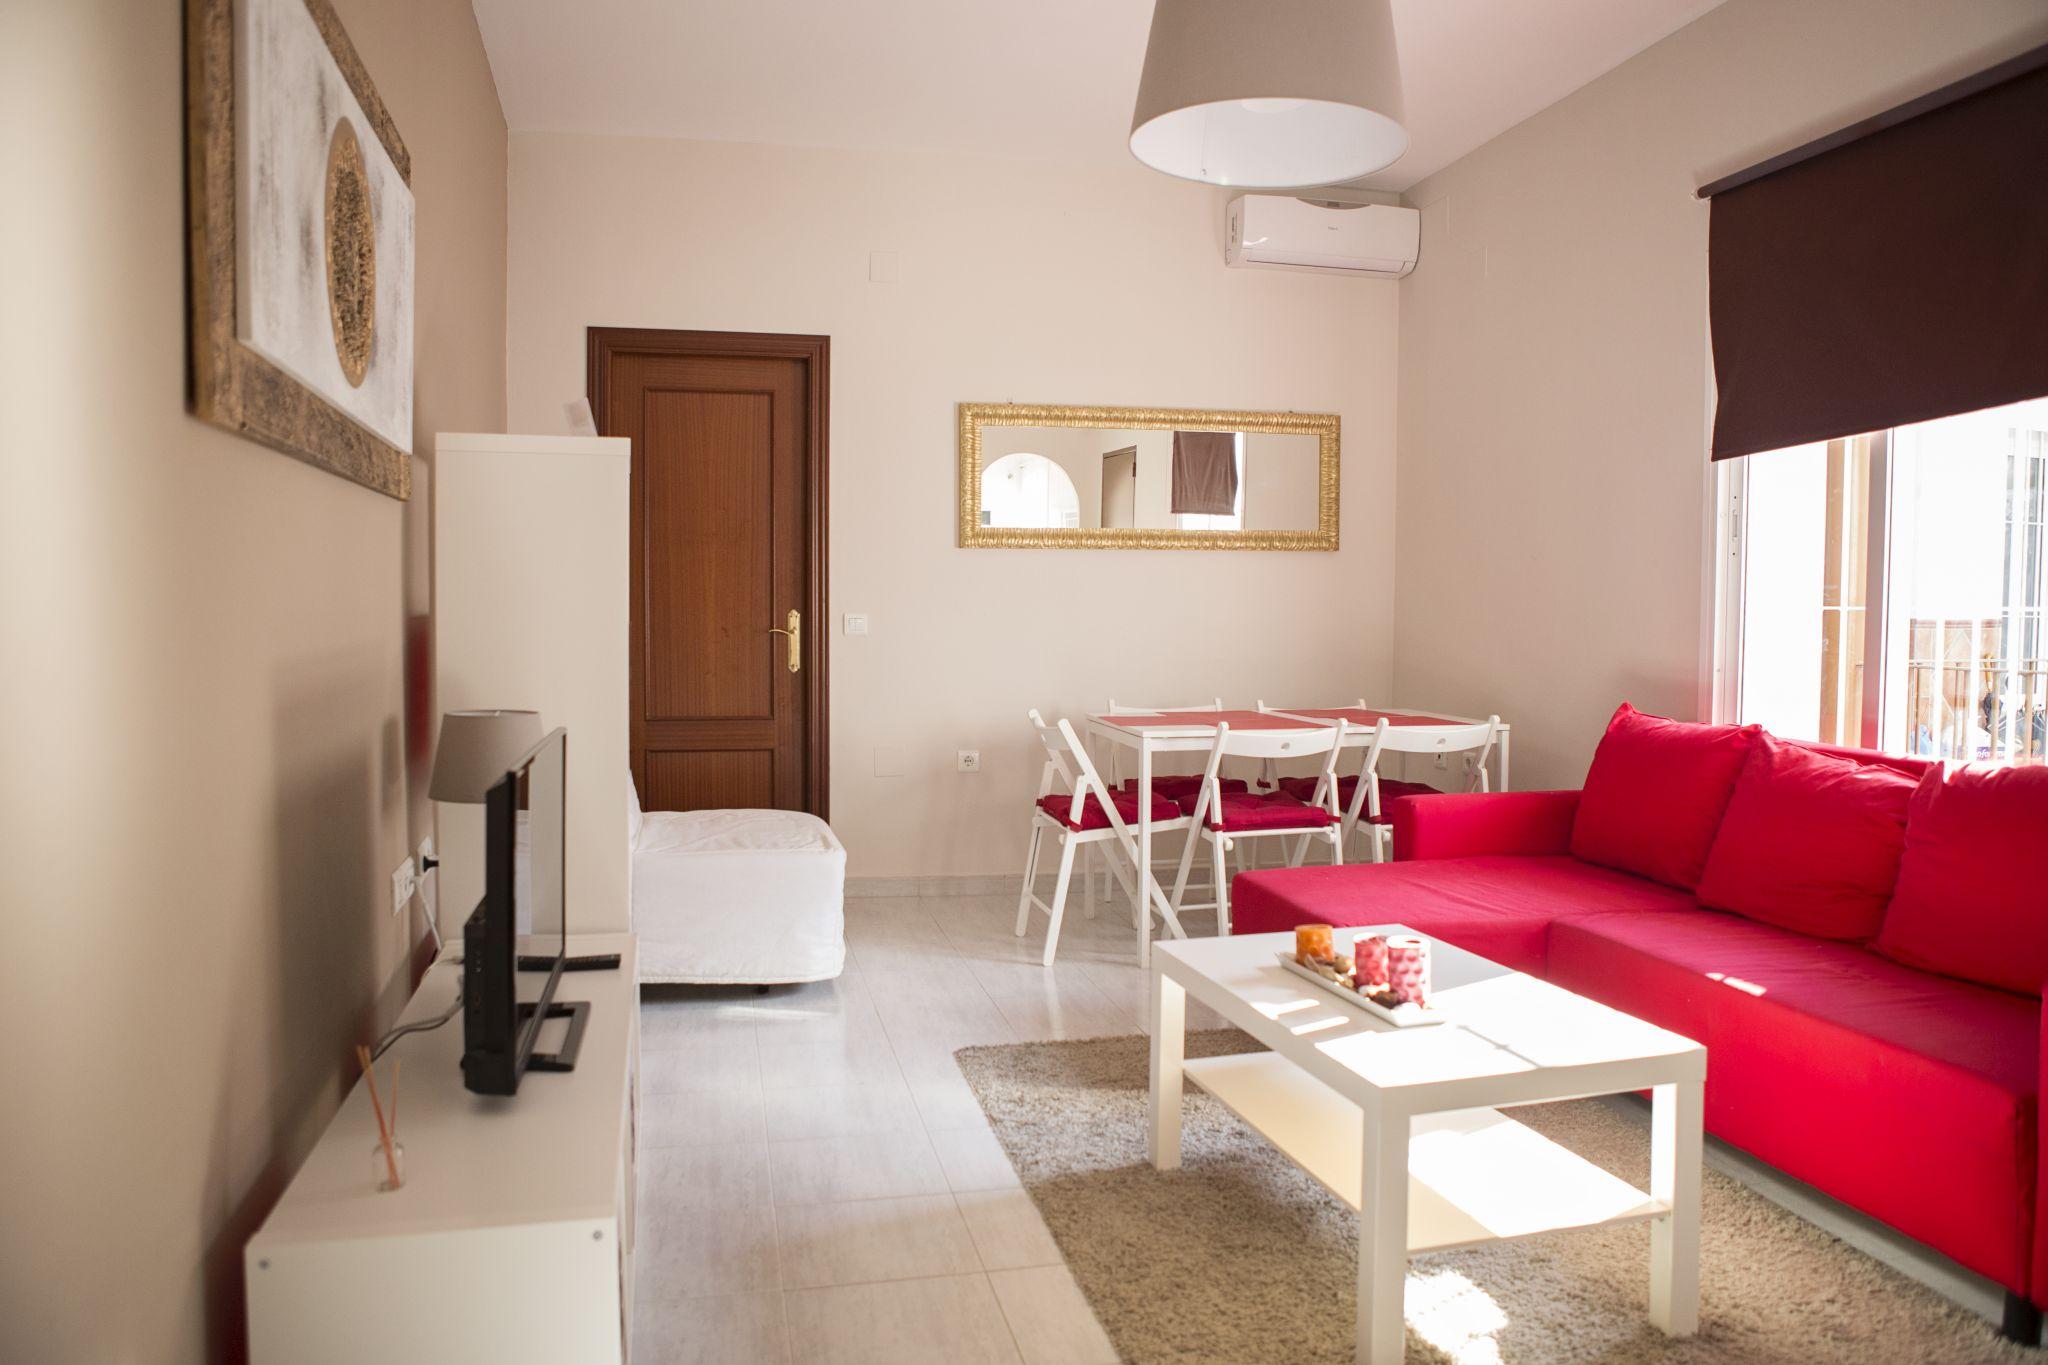 Suncity apartments web oficial alquiler de apartamentos en m laga - Apartamento vacacional malaga ...